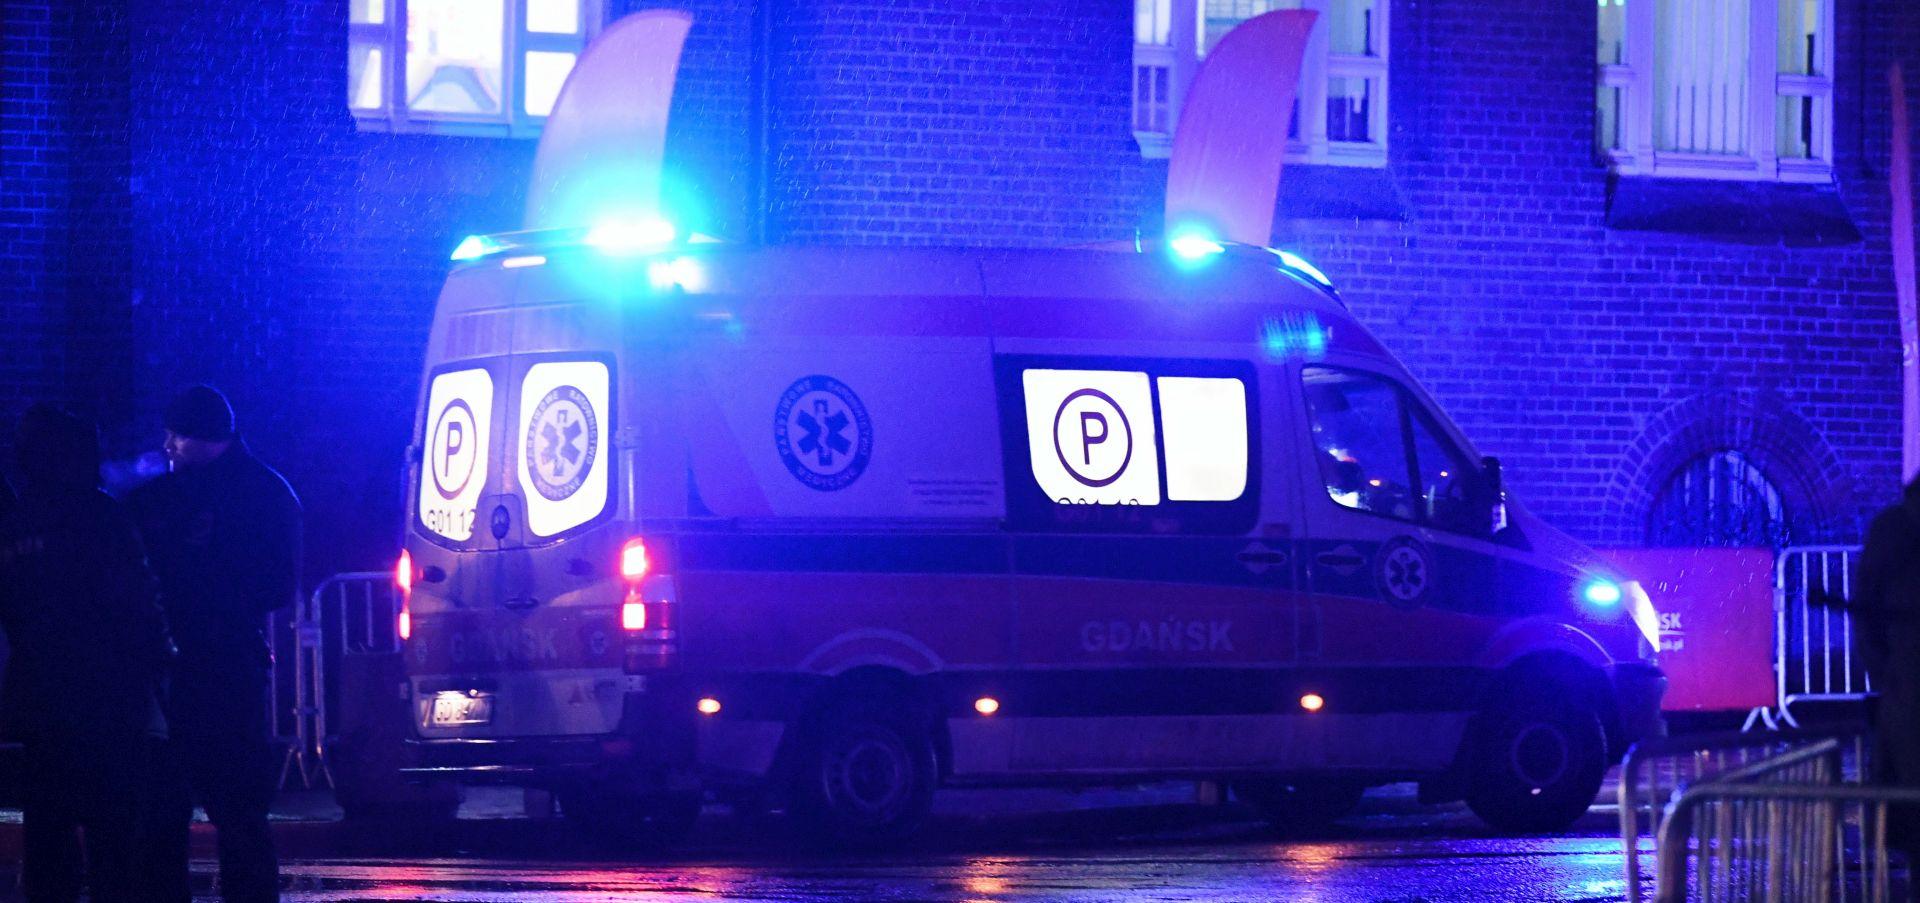 Preminuo gradonačelnik Gdanjska izboden na humanitarnom skupu